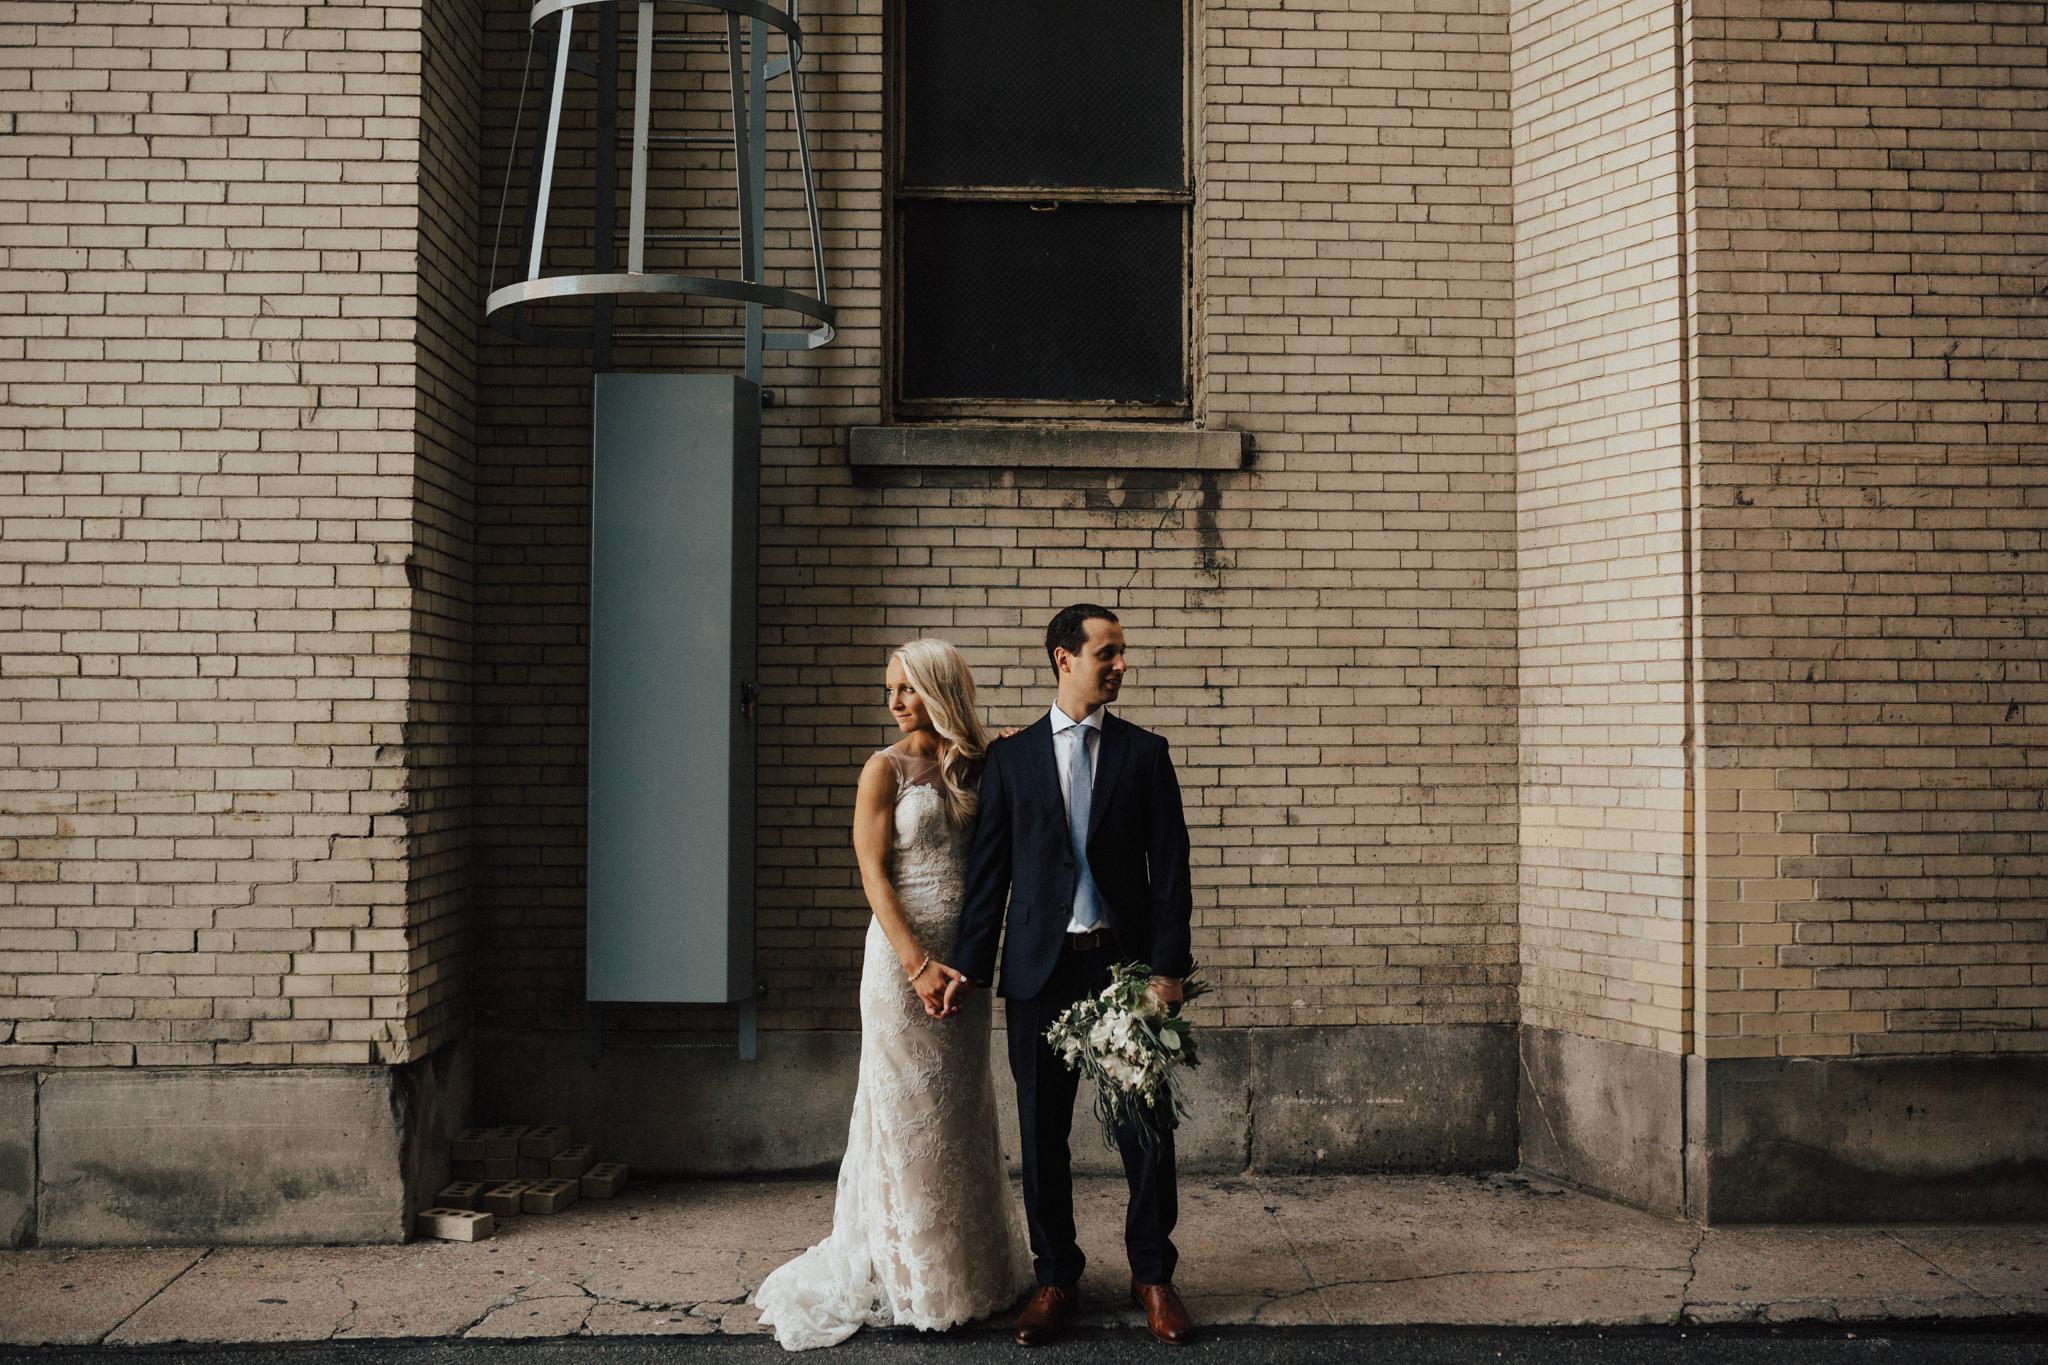 Arizona-Adventure-Elopement-Wedding-Photographer-129.jpg